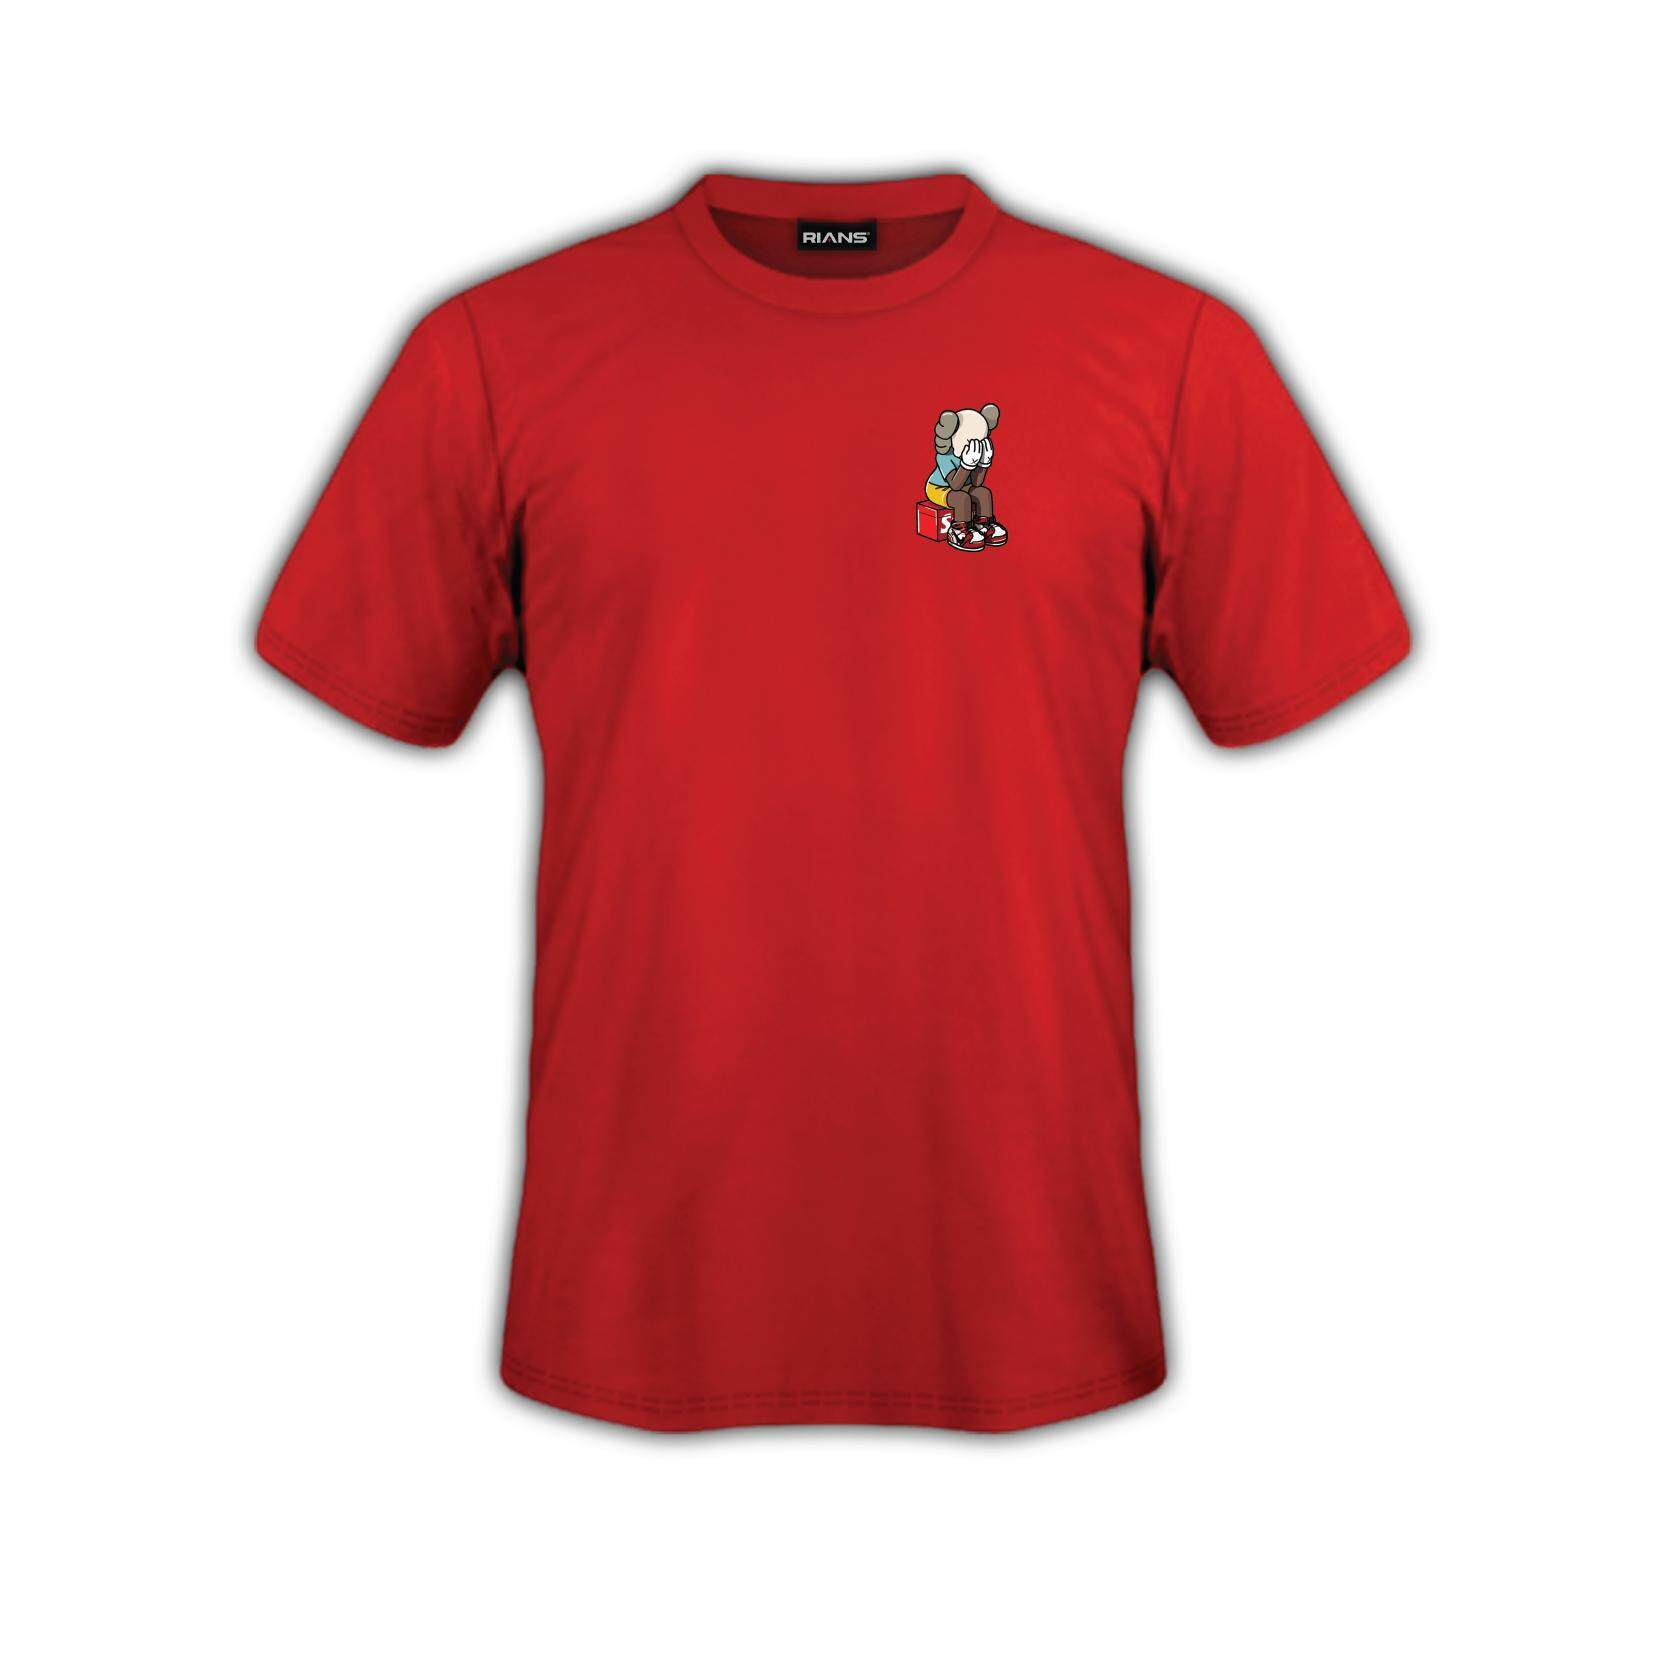 T-Shirt KAWS Left Logo Viral 4 Colour 100% Cotton Baju Tshirt Black White Hitam Putih Bossku